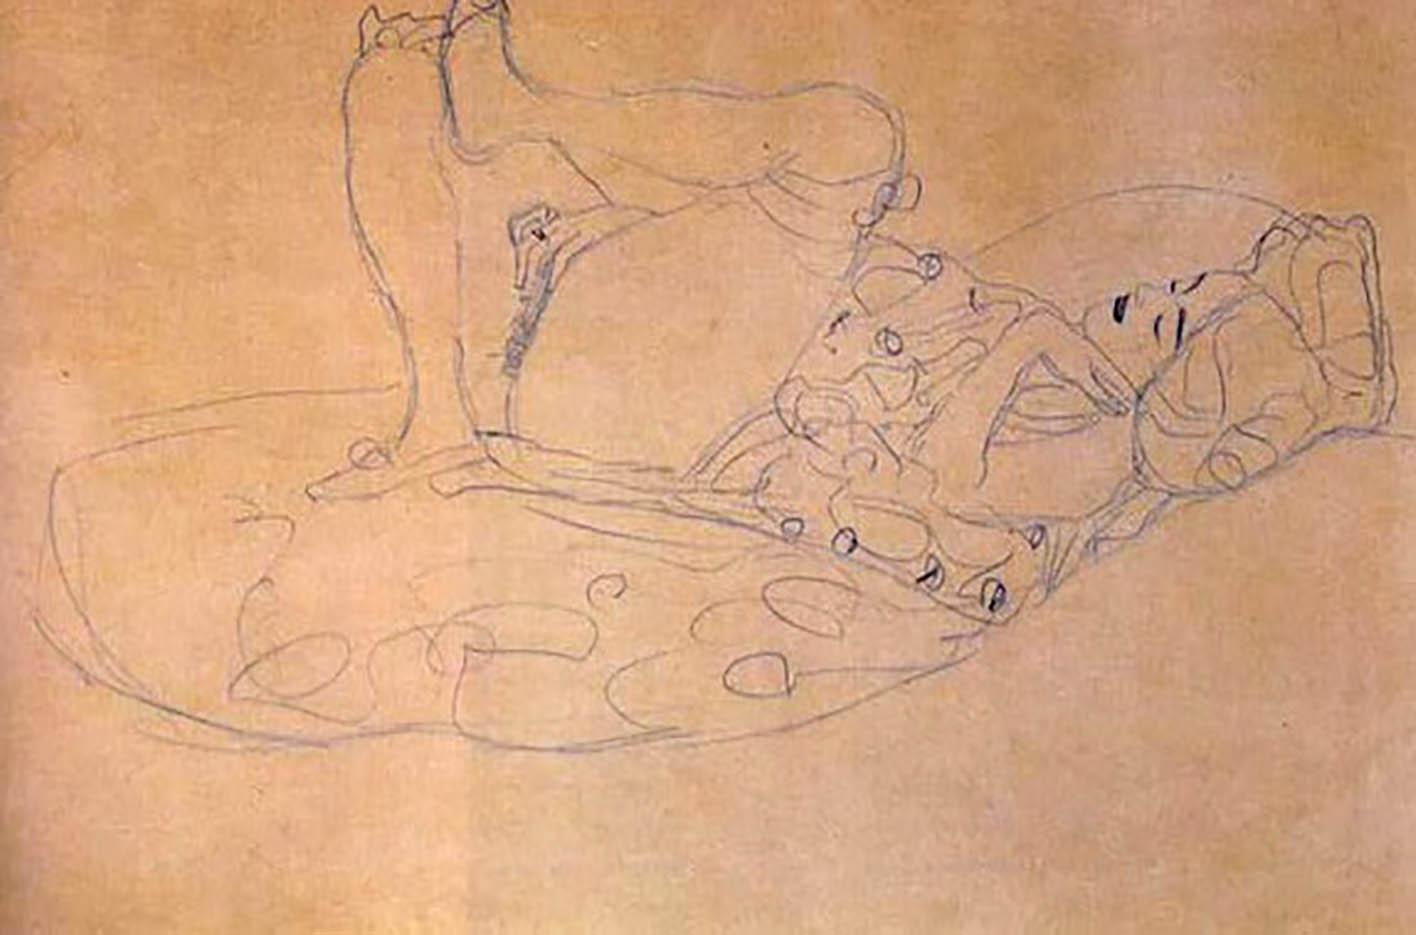 Густав Климт (Gustav Klimt) эскиз, Reclining Female